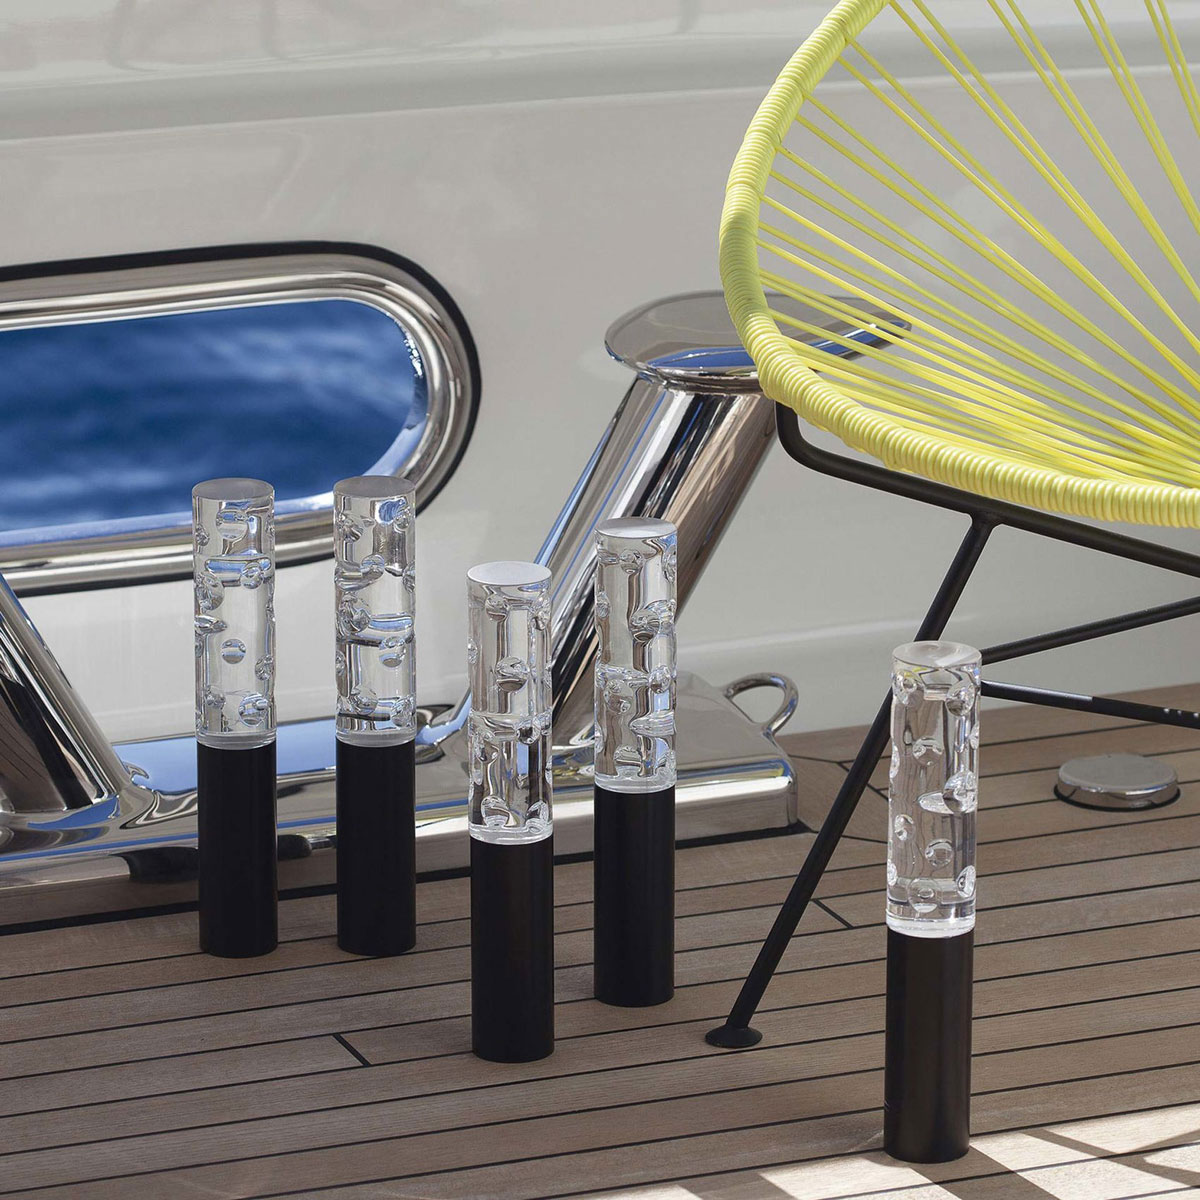 Baccarat Crystal, Jallum Pontil Candle Lamps, Set of 4, Black